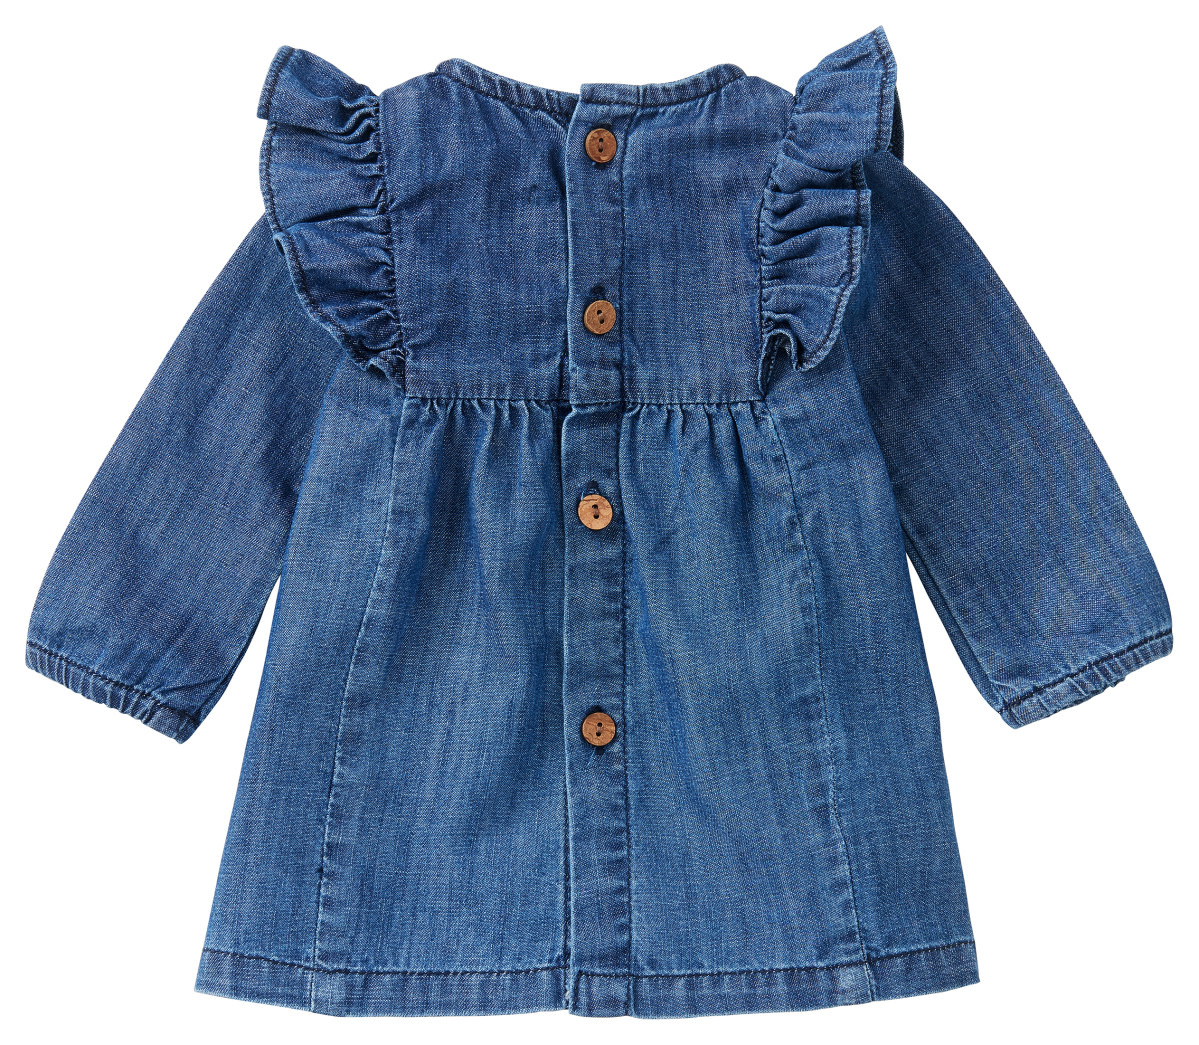 Noppies Noppies Marana Long Sleeve Dress - Medium Wash